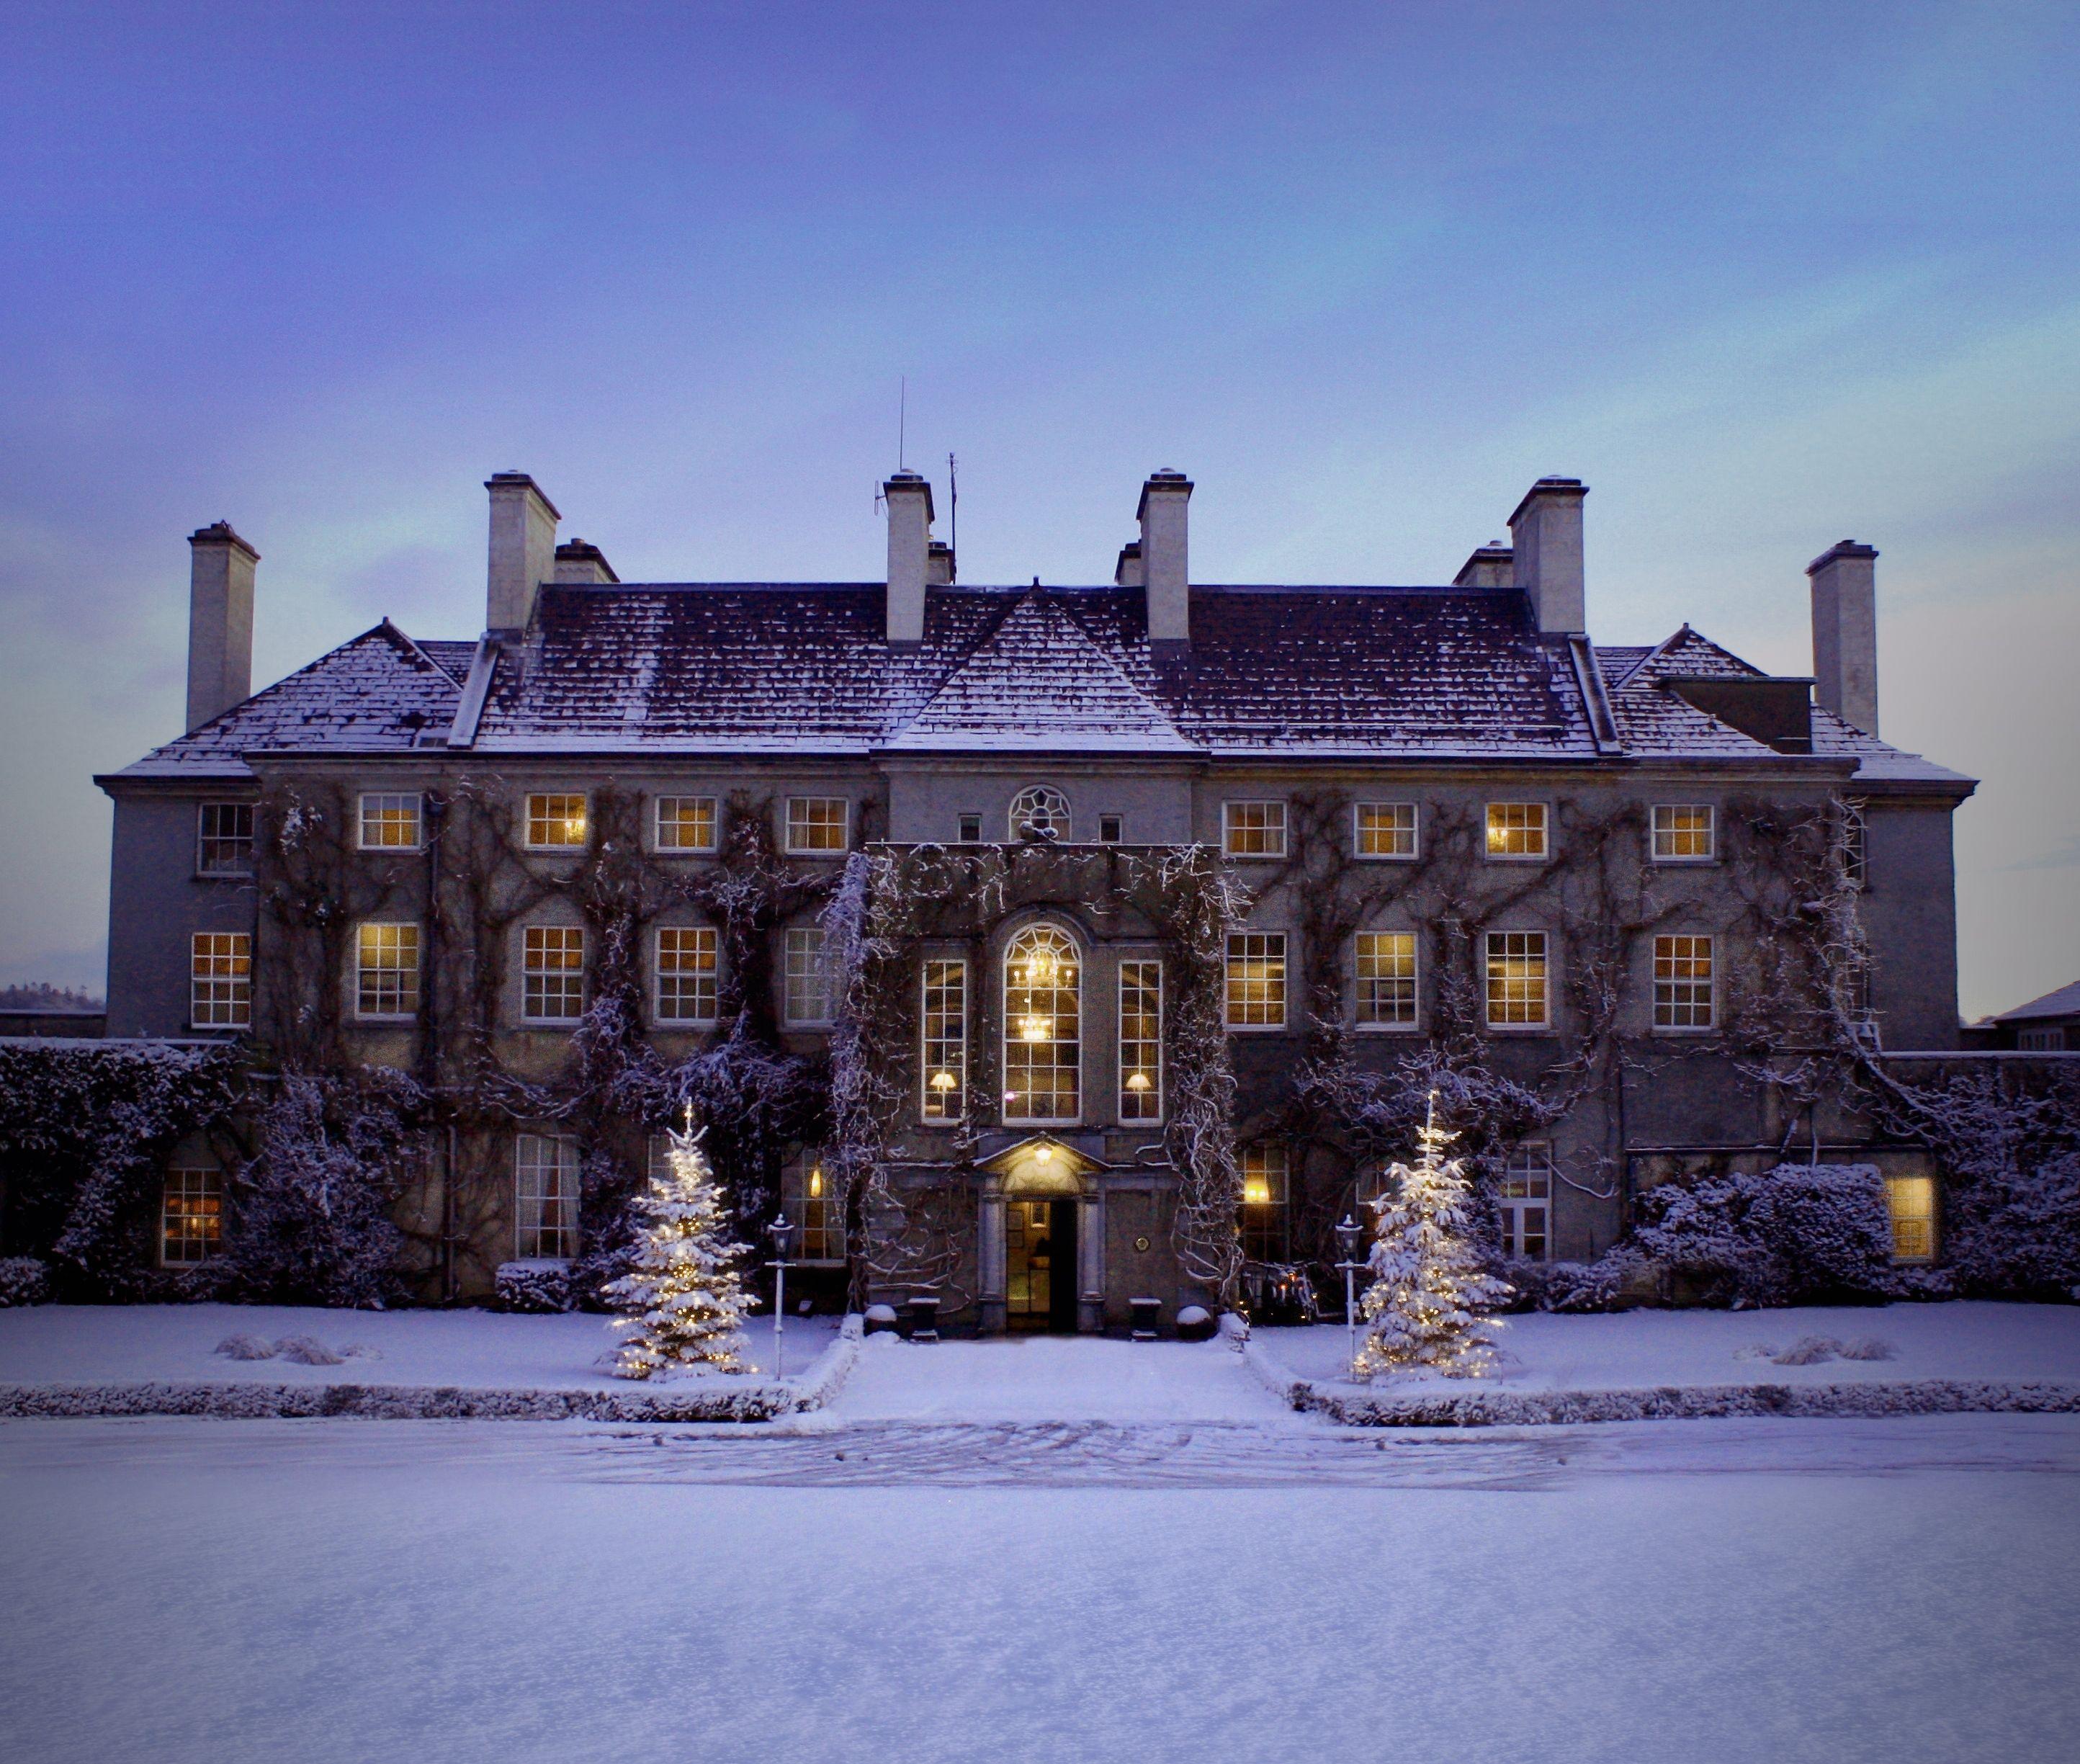 Mount_juliet_estate_s_manor_house_